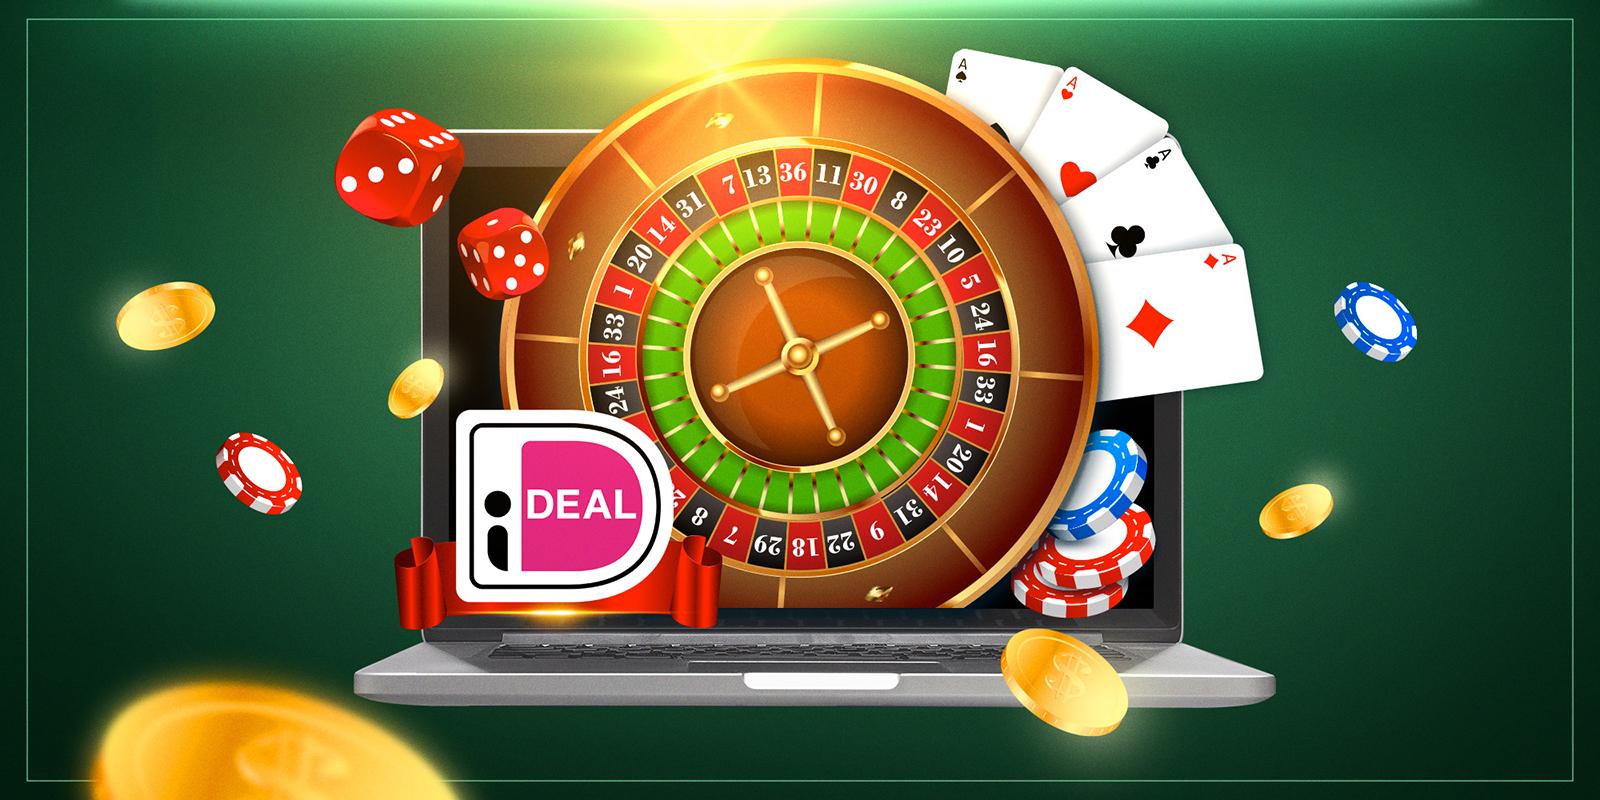 gambling casino games recreation poker table